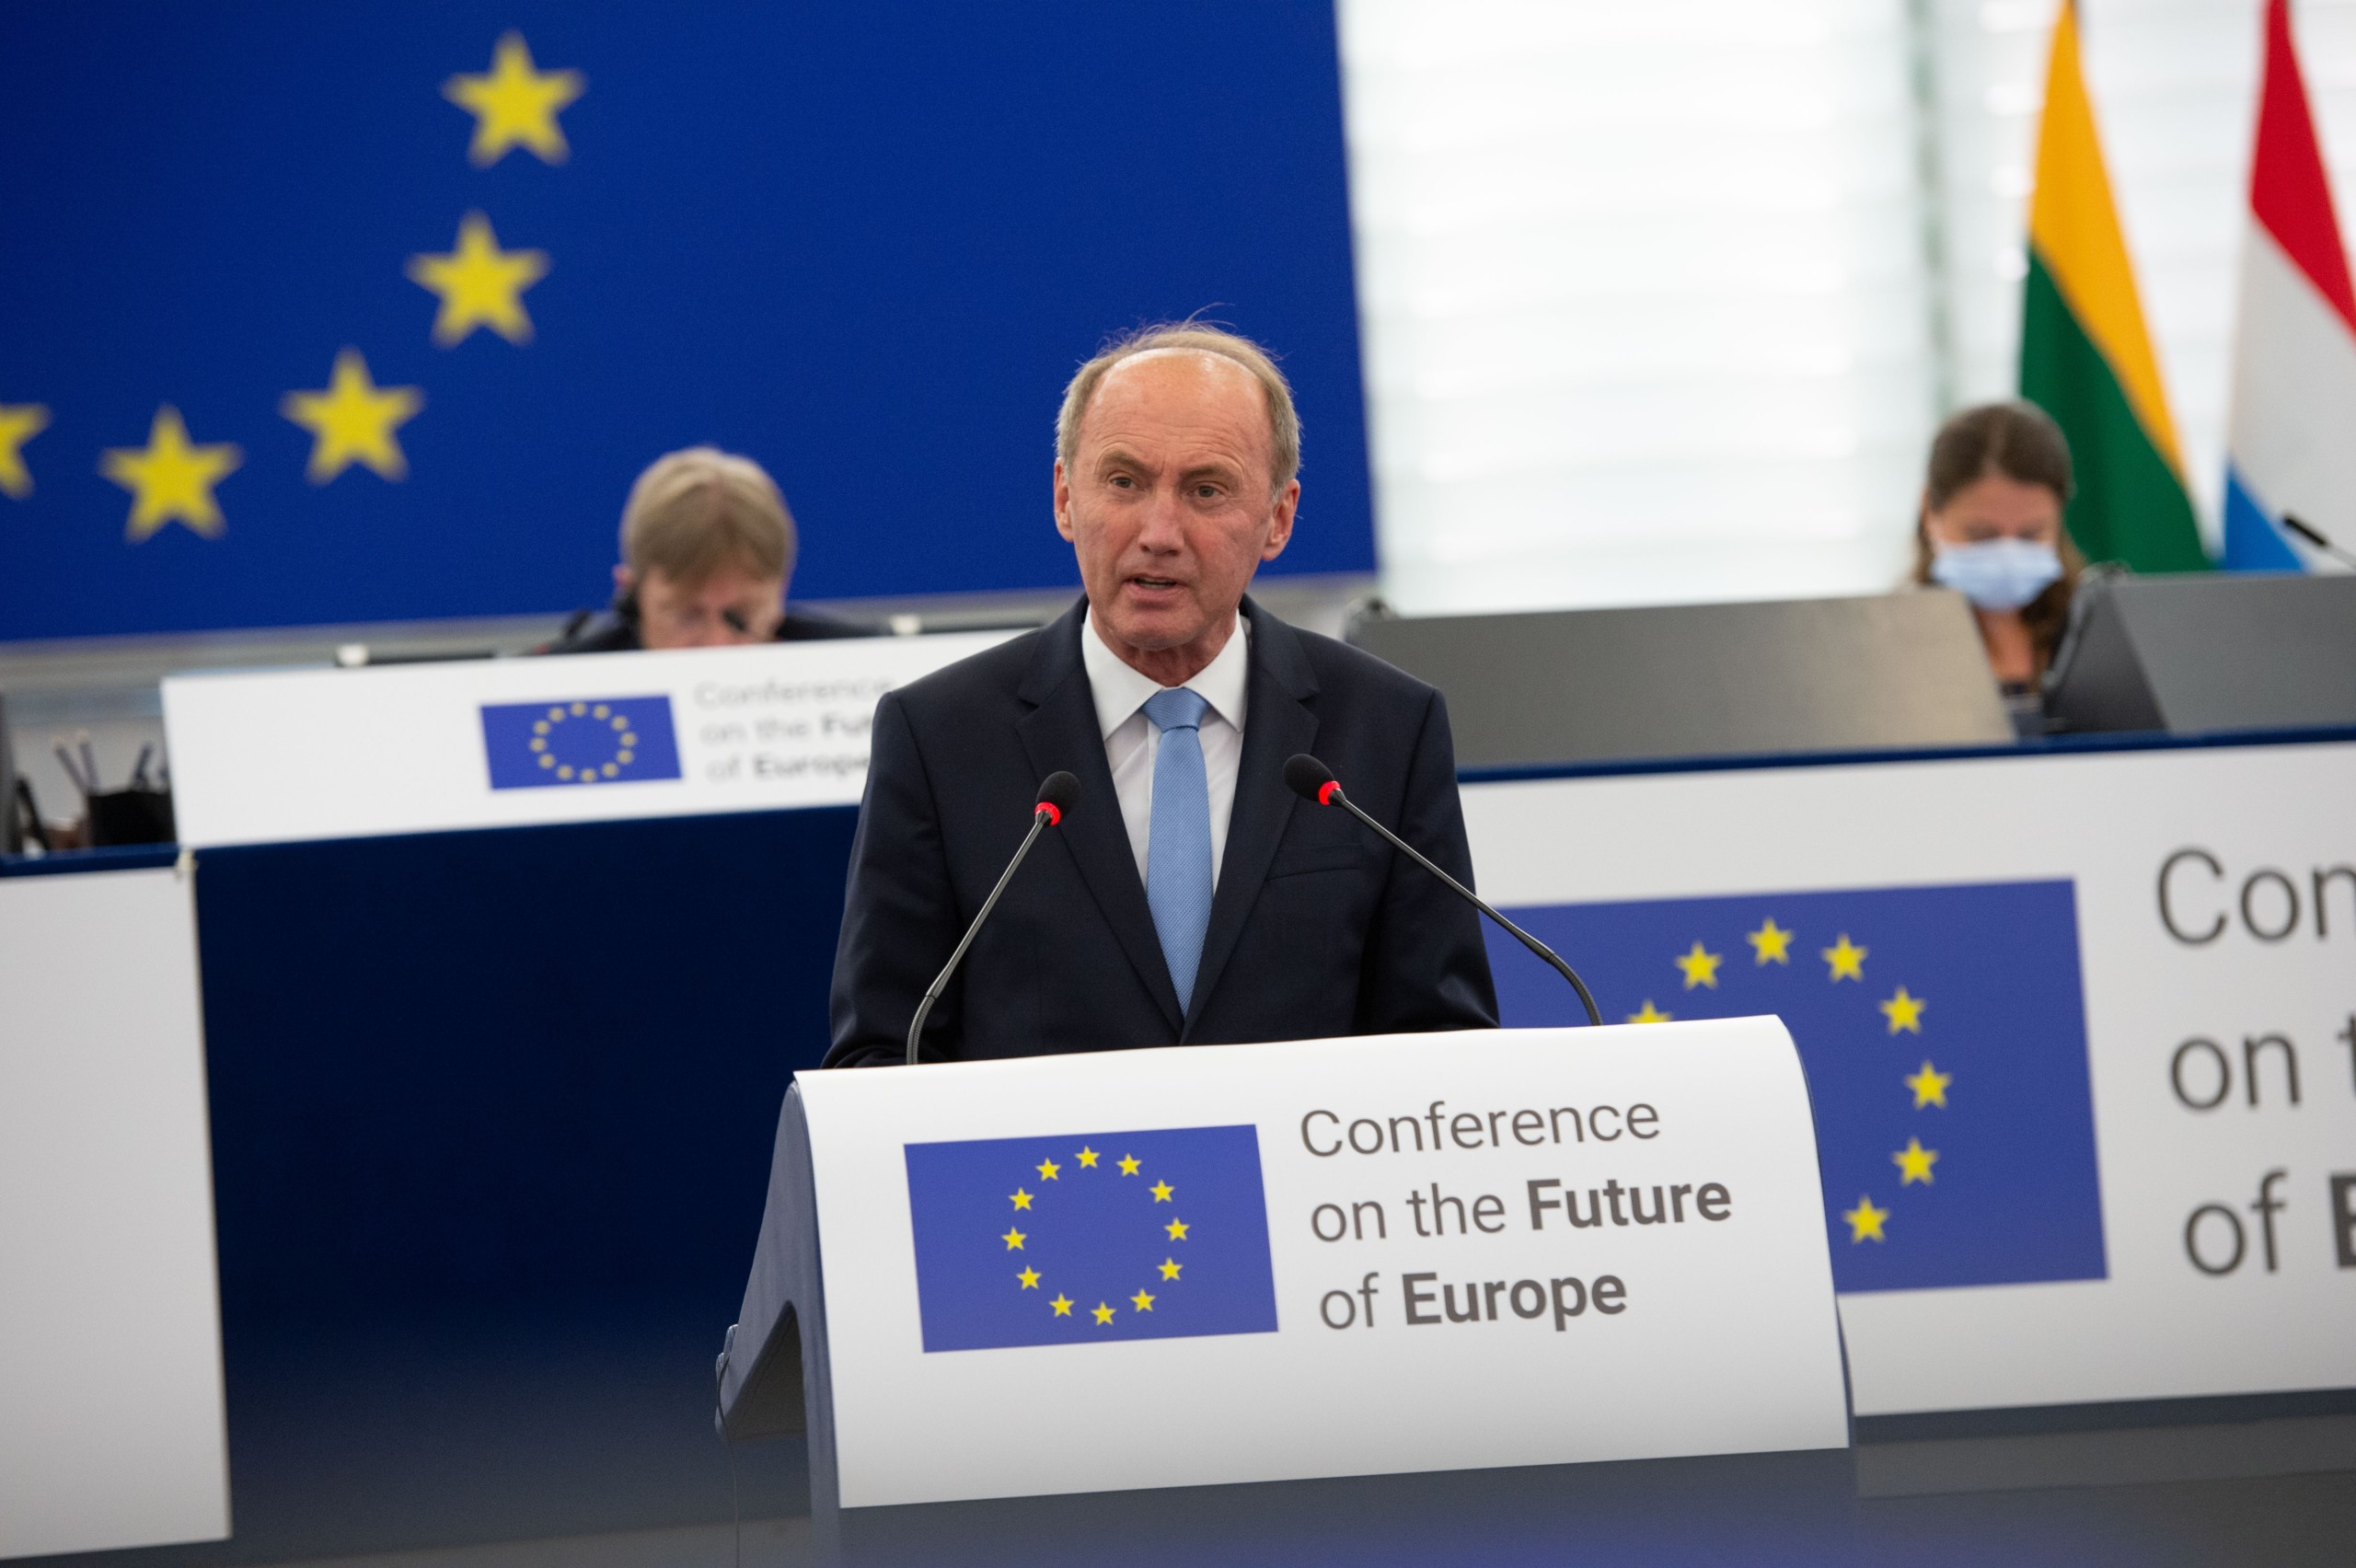 Conference on the Future of Europe (CoFoE) - Inaugural Plenary